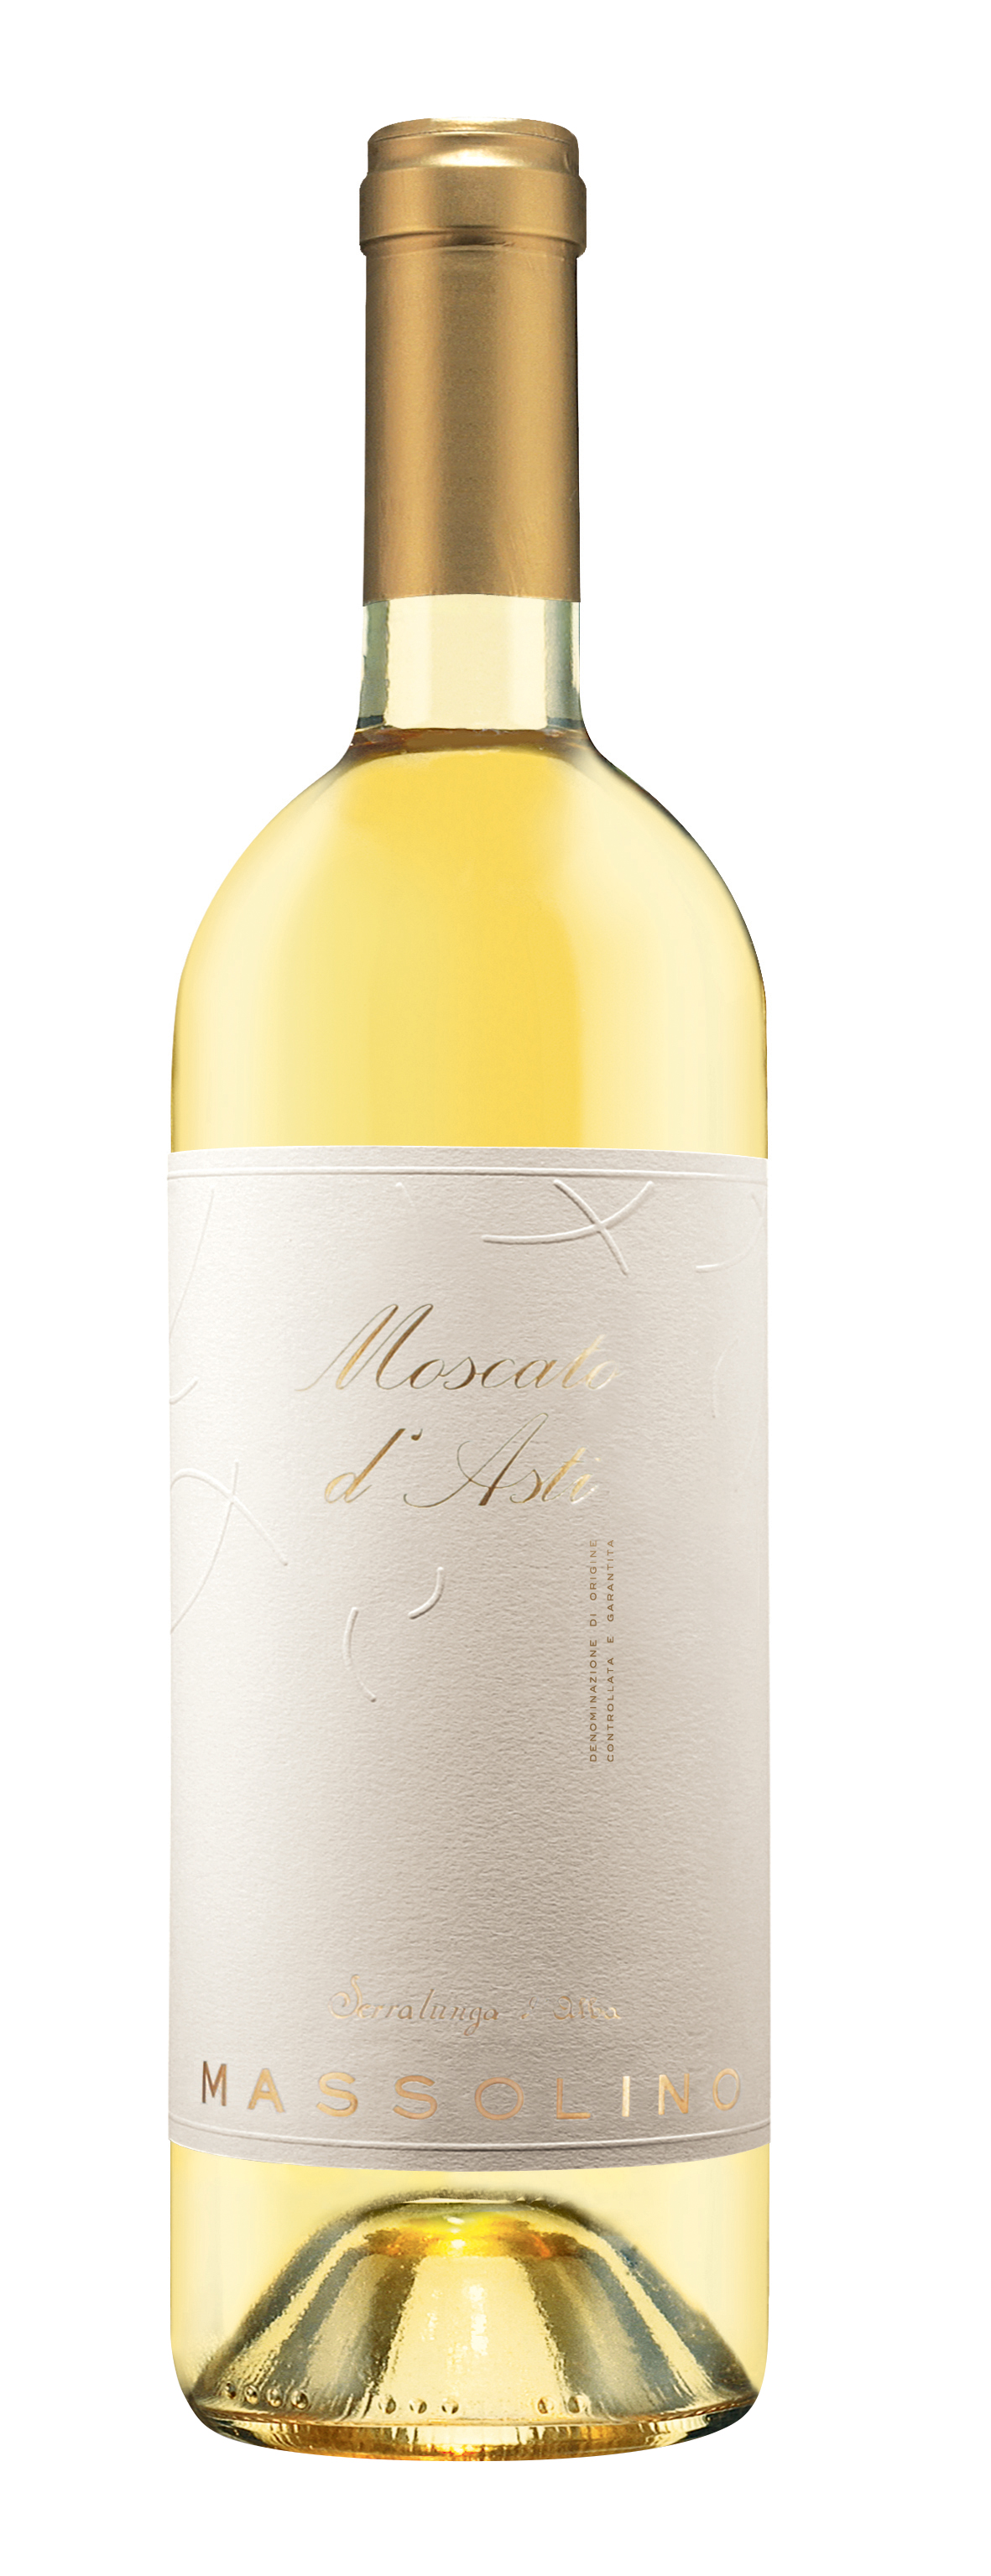 Massolino Moscato d'Asti Bottle.jpg